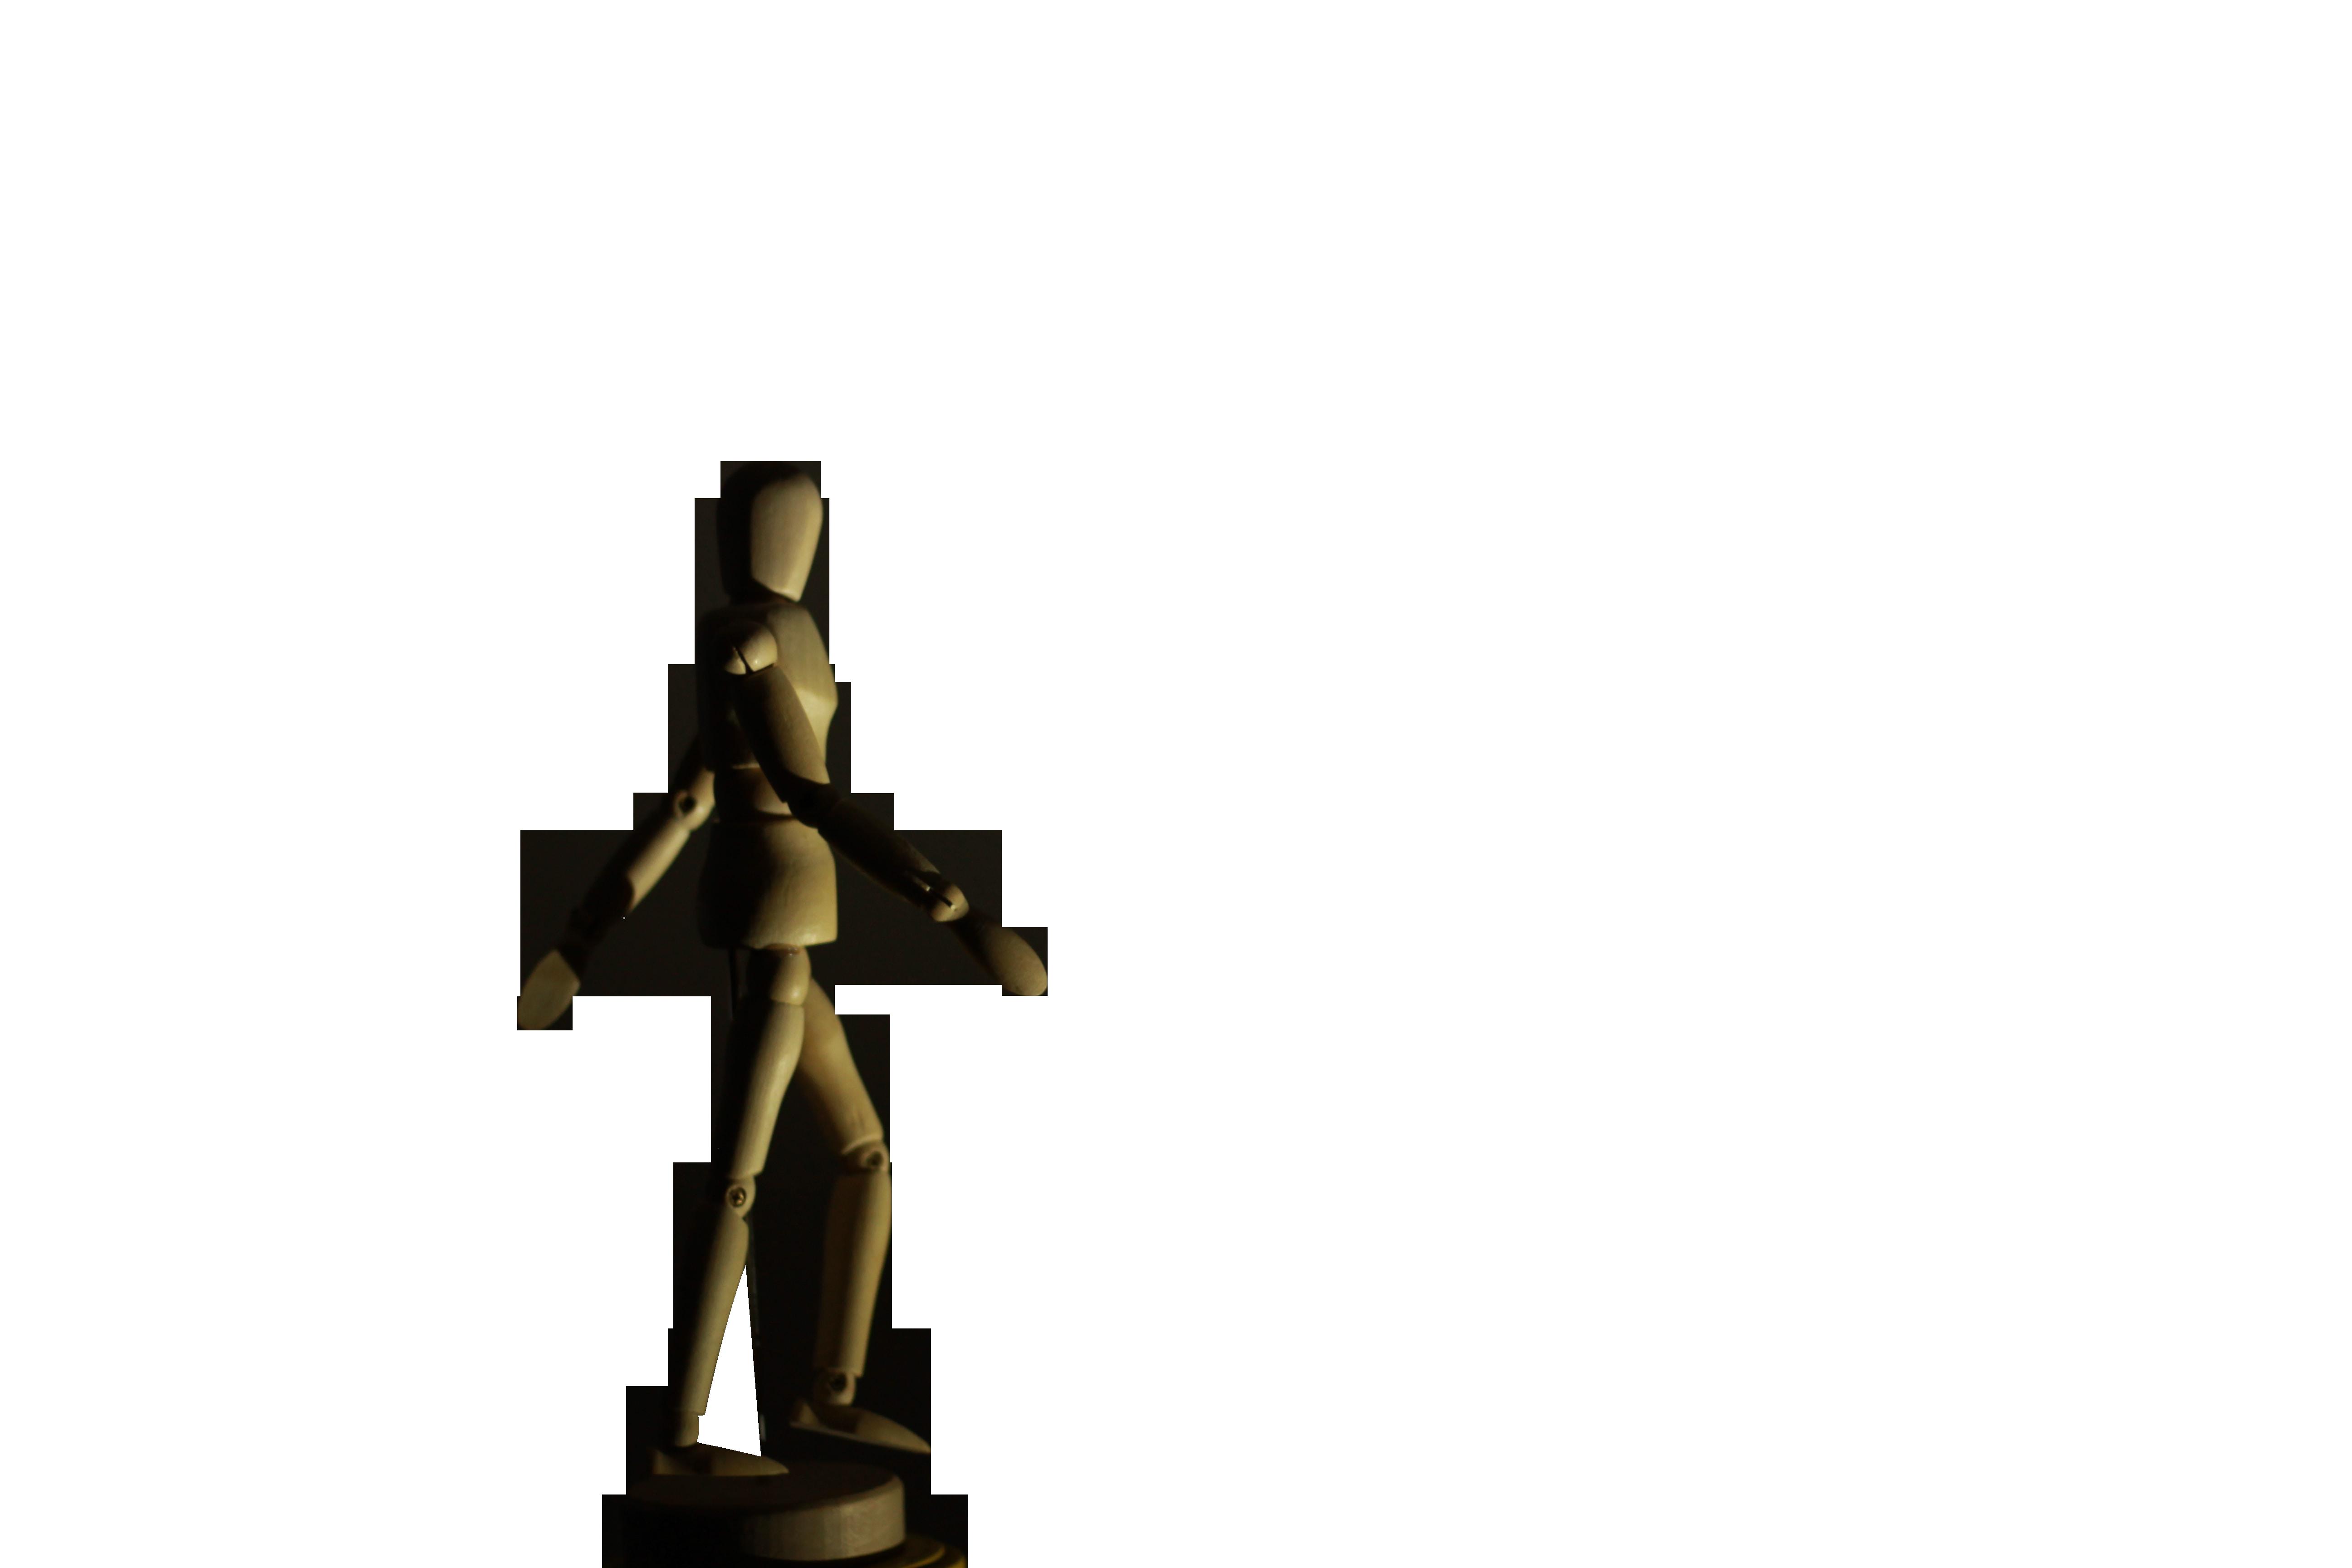 Wooden Man Transparent Background PNG